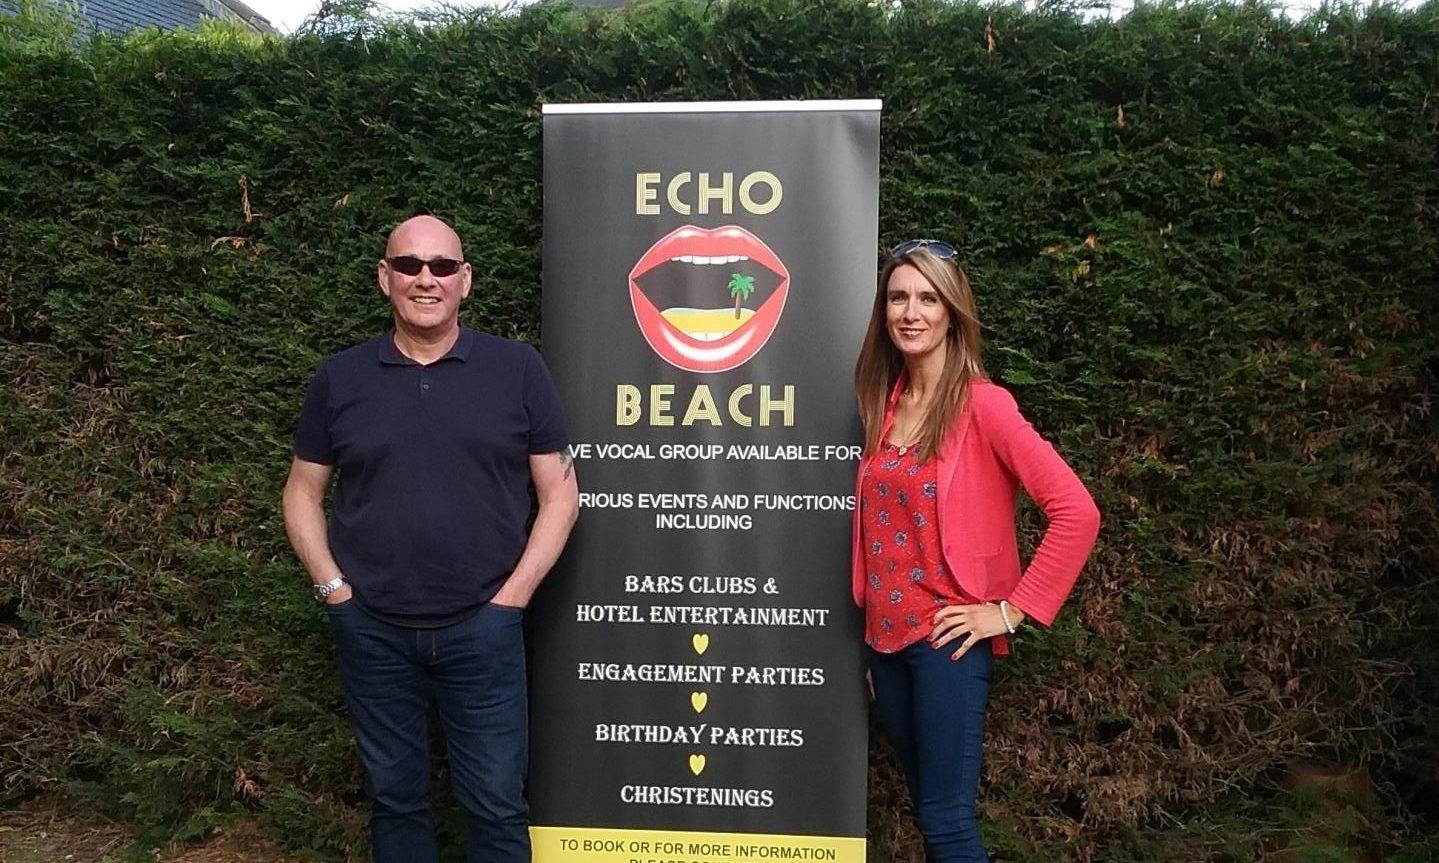 Paul McGregor and Elaine Carlin of Dundee music duo Echo Beach.